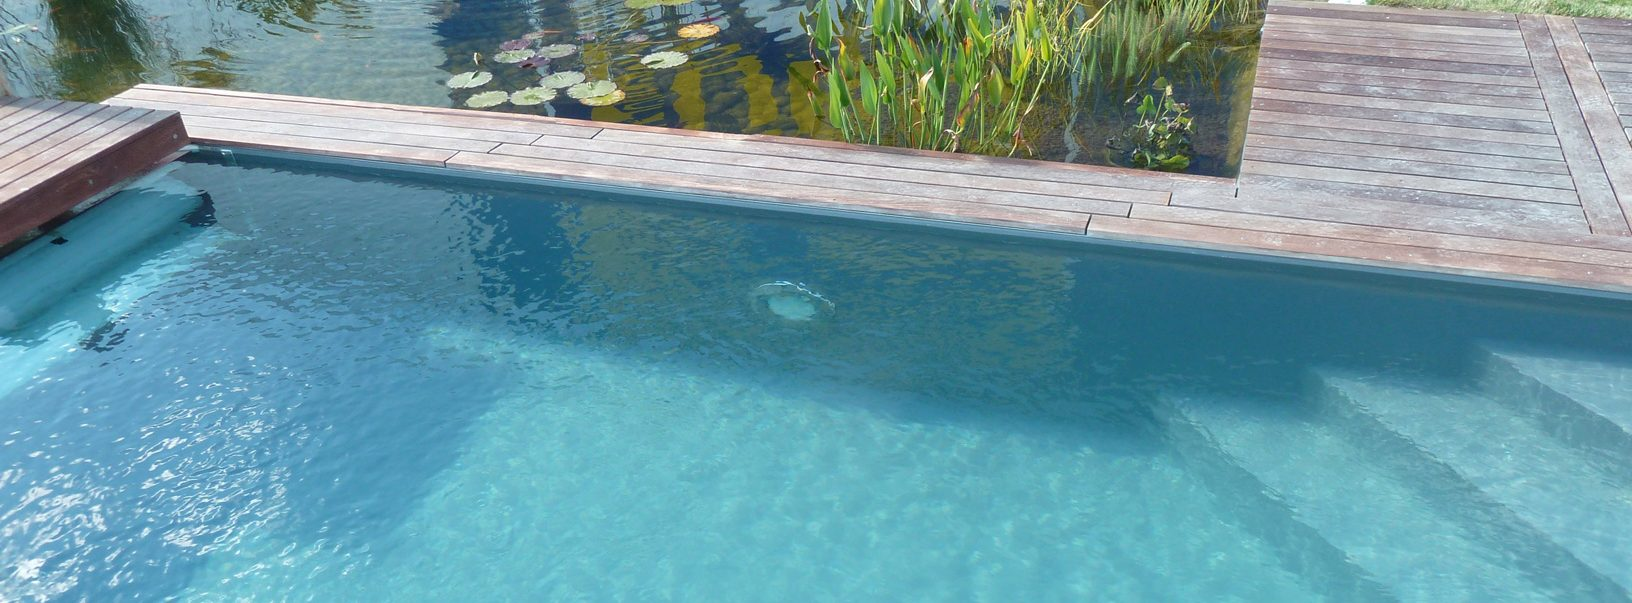 Installation d 39 escalier de piscine dans la r gion lilloise for Piscine 59